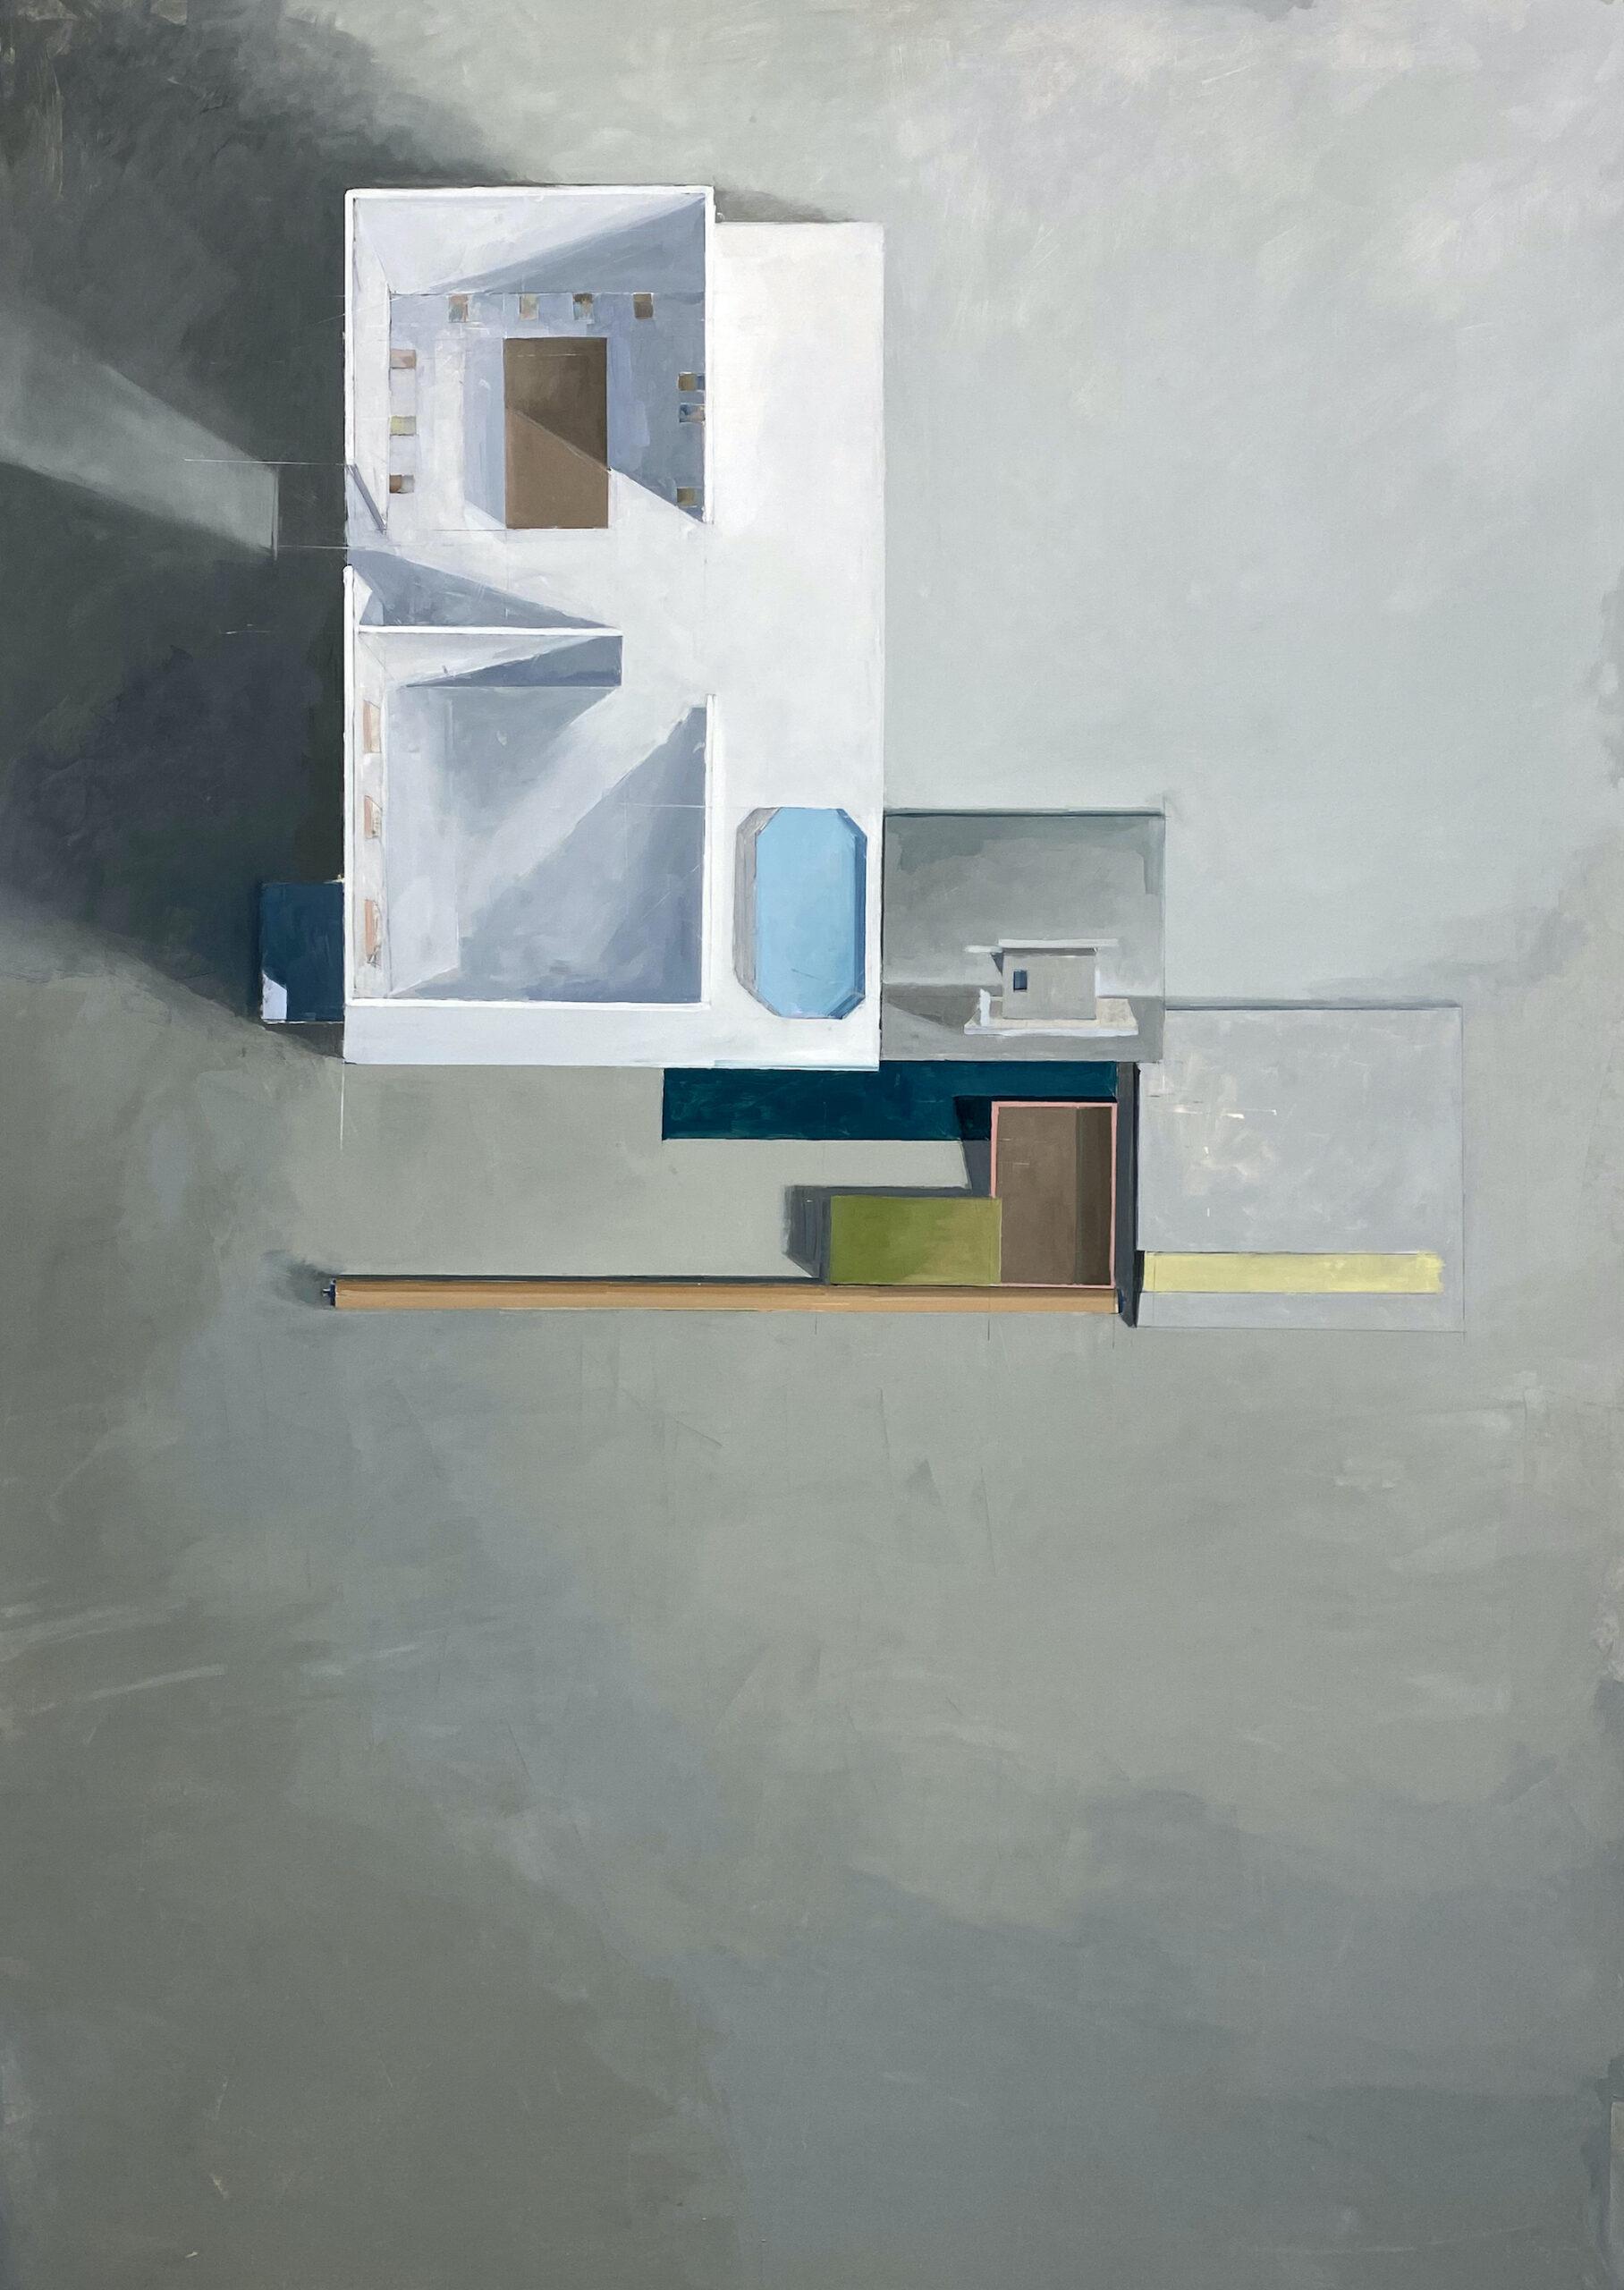 Jenny Brillhart, Inklings, 2021